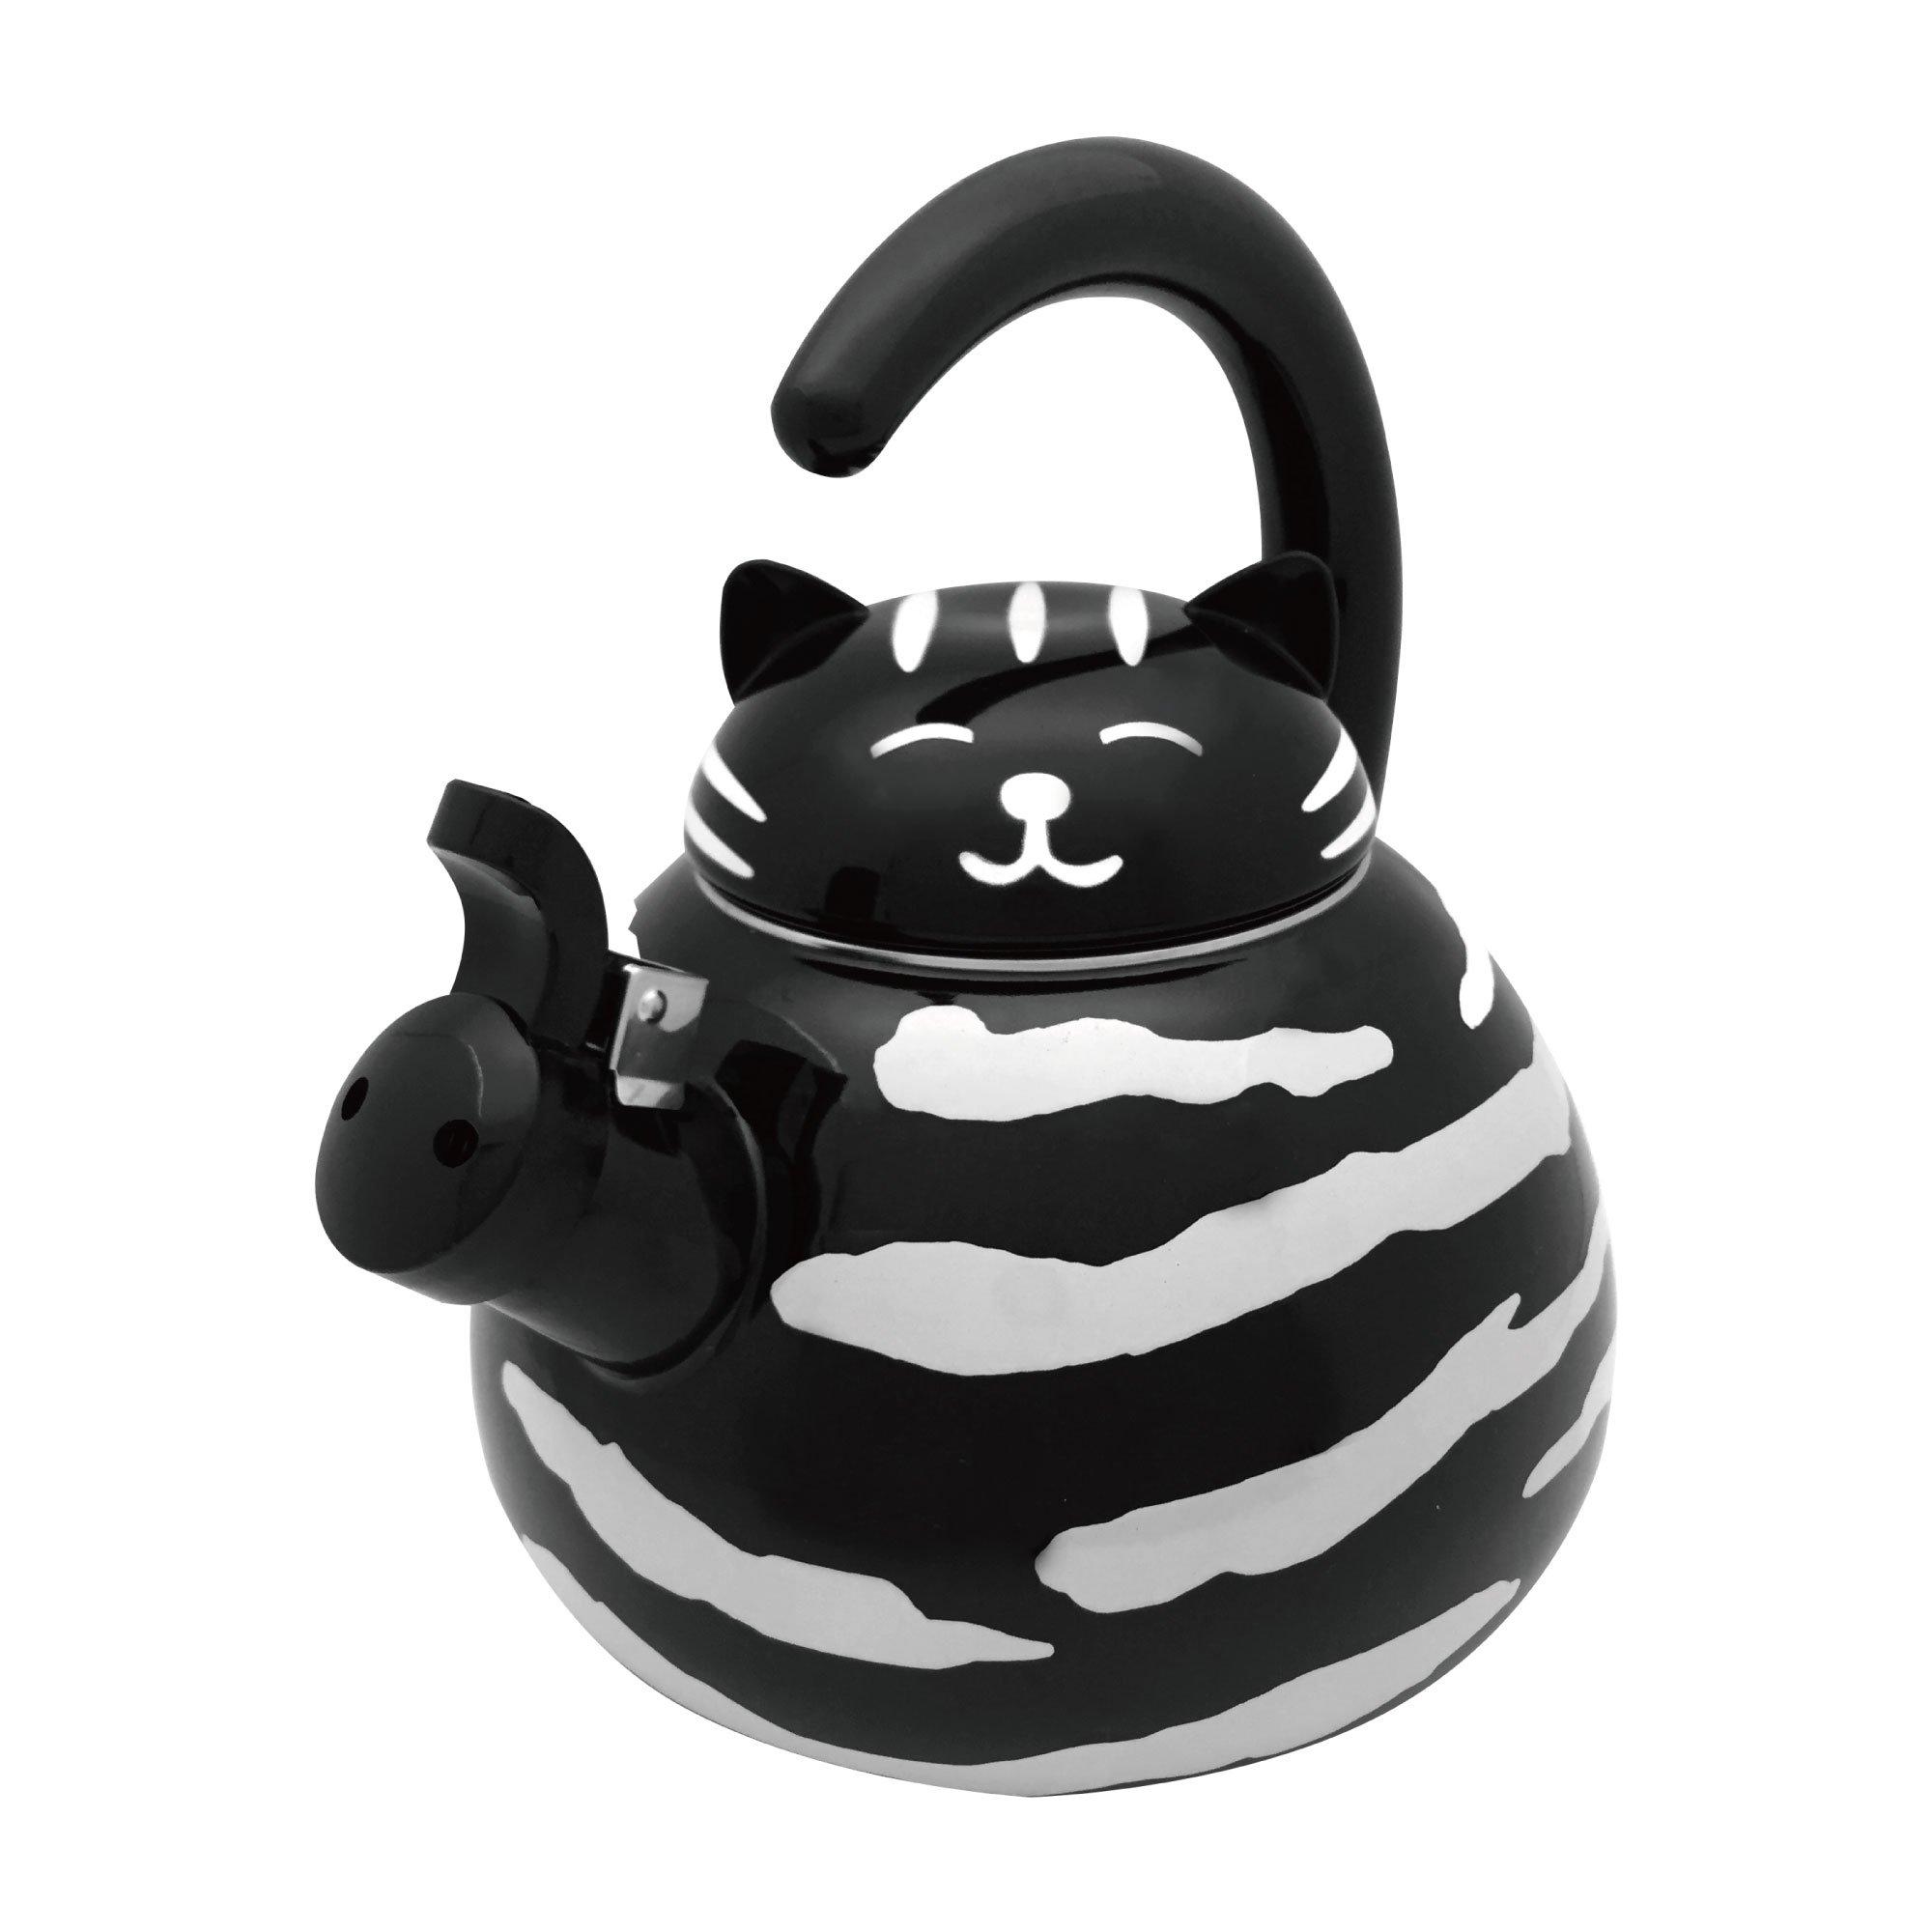 Supreme Housewares Gourmet Art Black Cat Enamel-on-Steel Whistling Kettle by Supreme Housewares (Image #3)